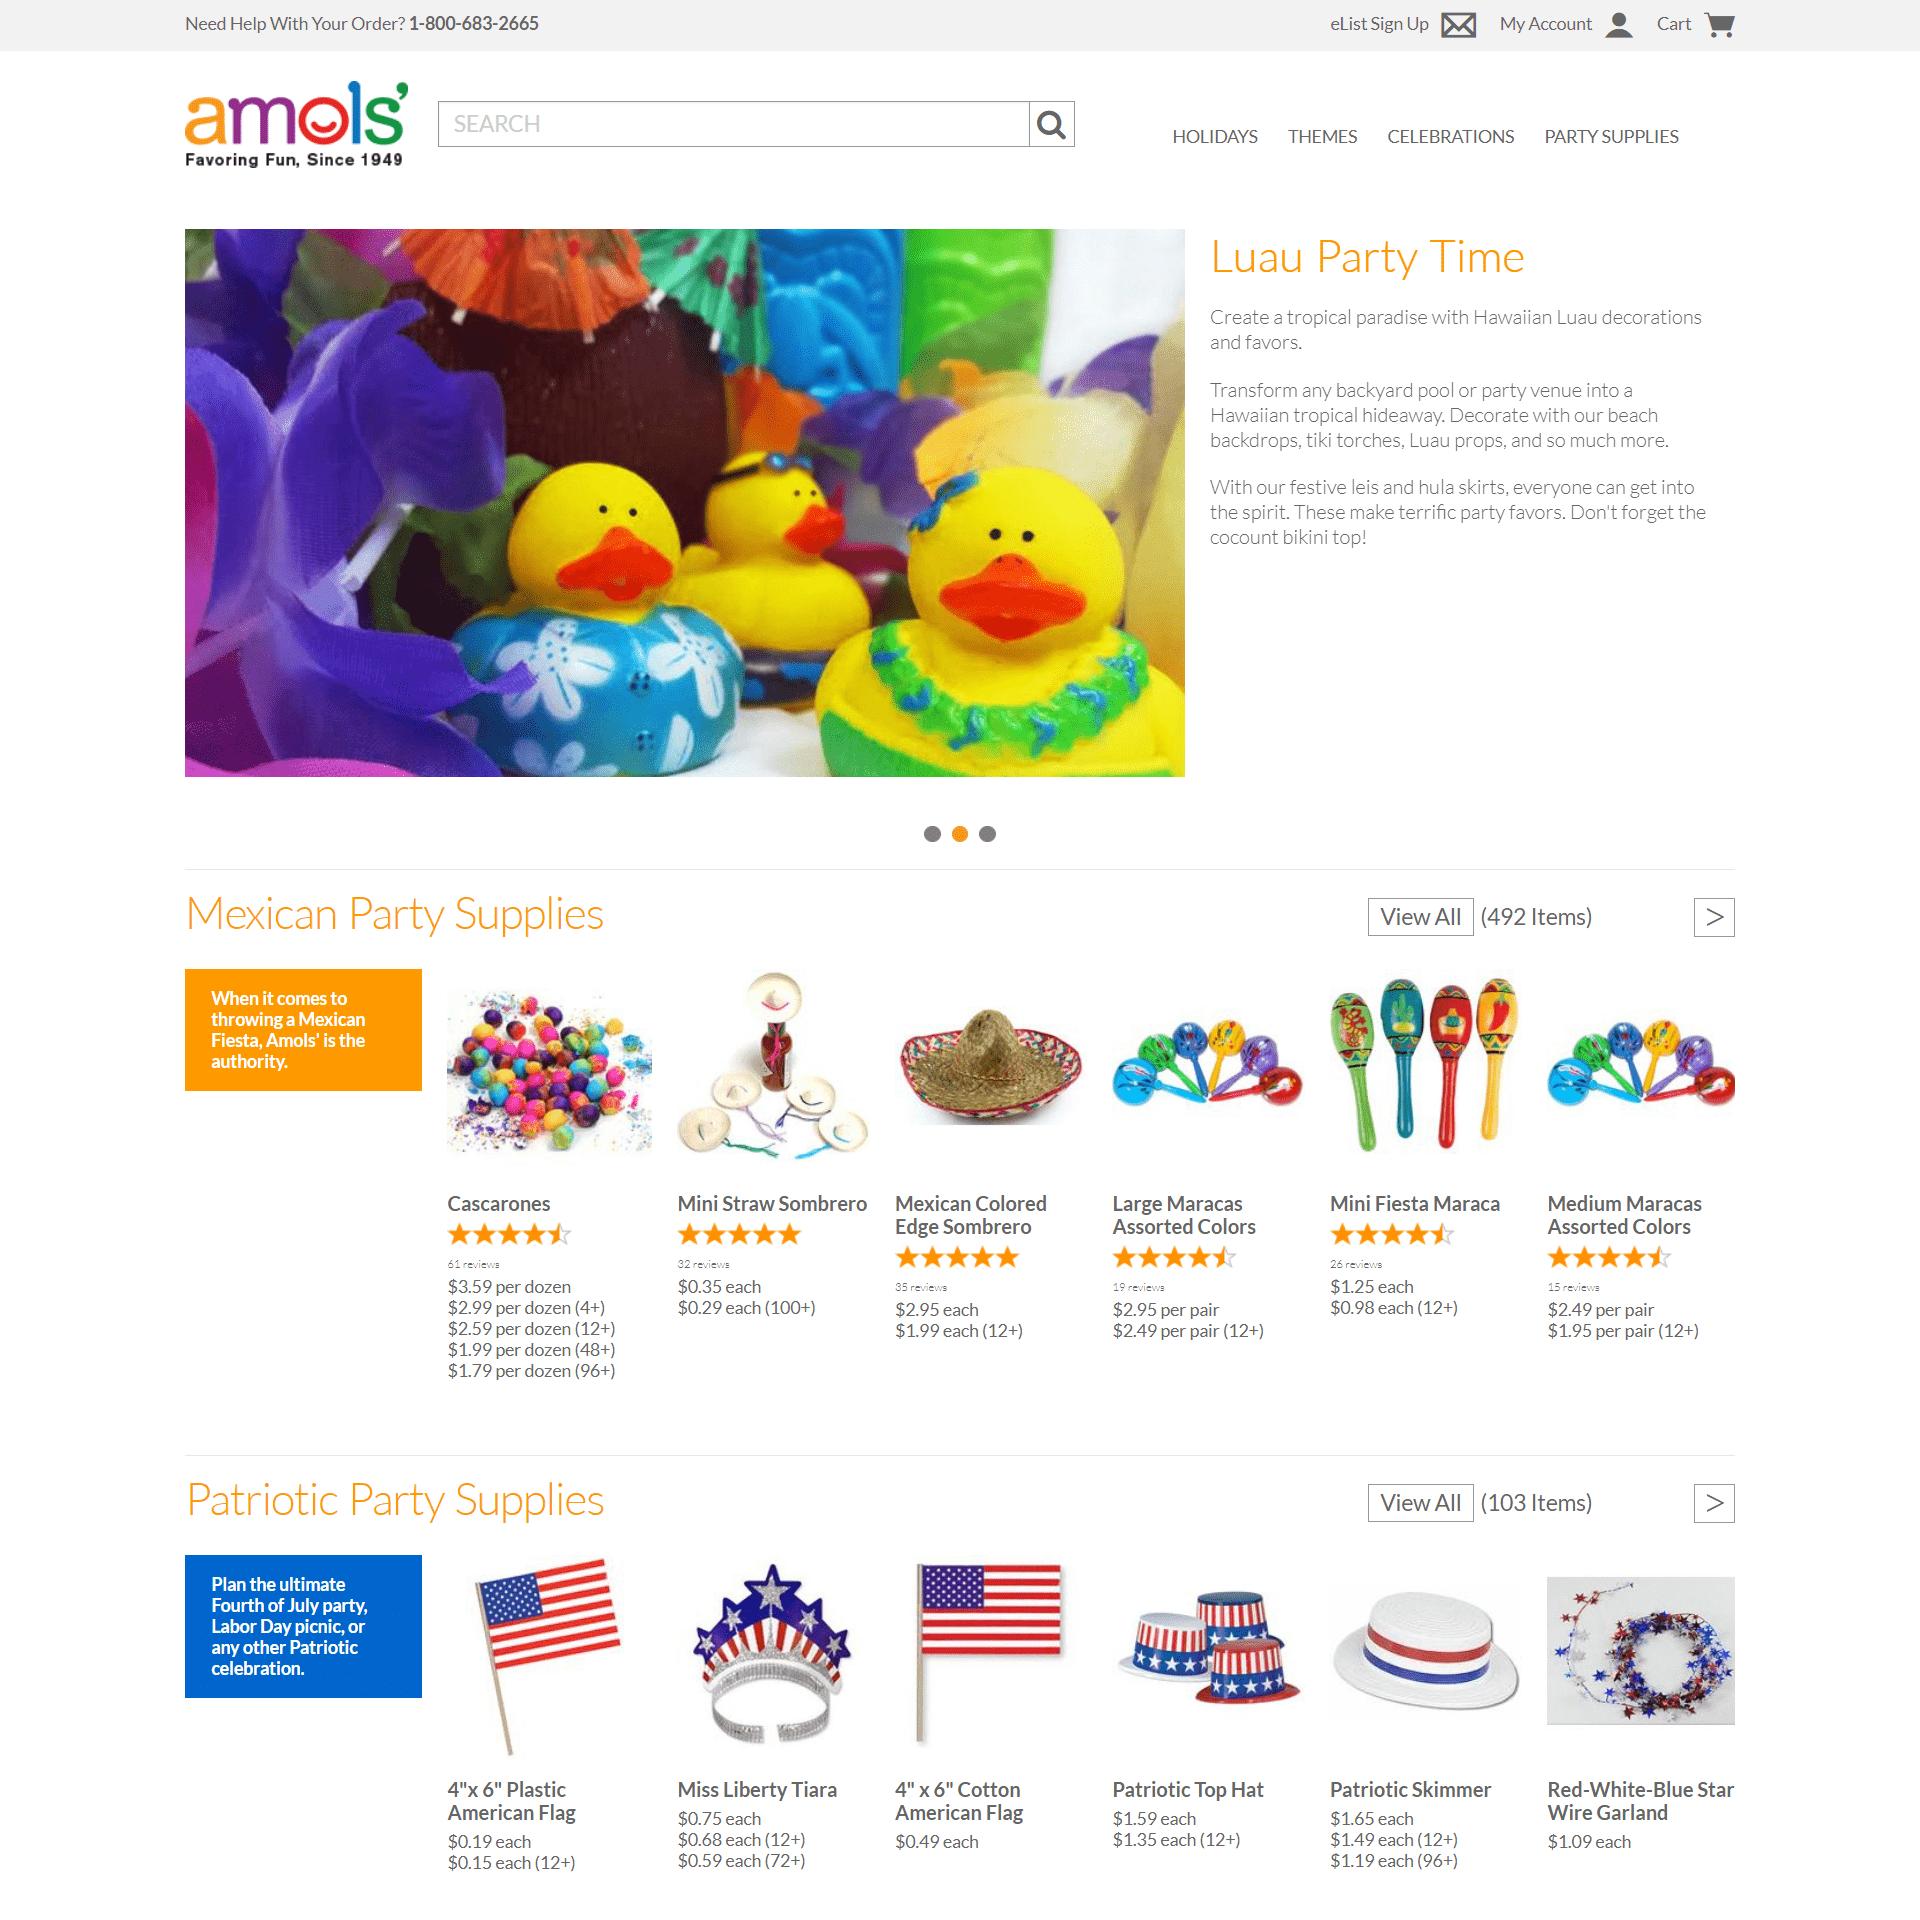 Amols' Specialty